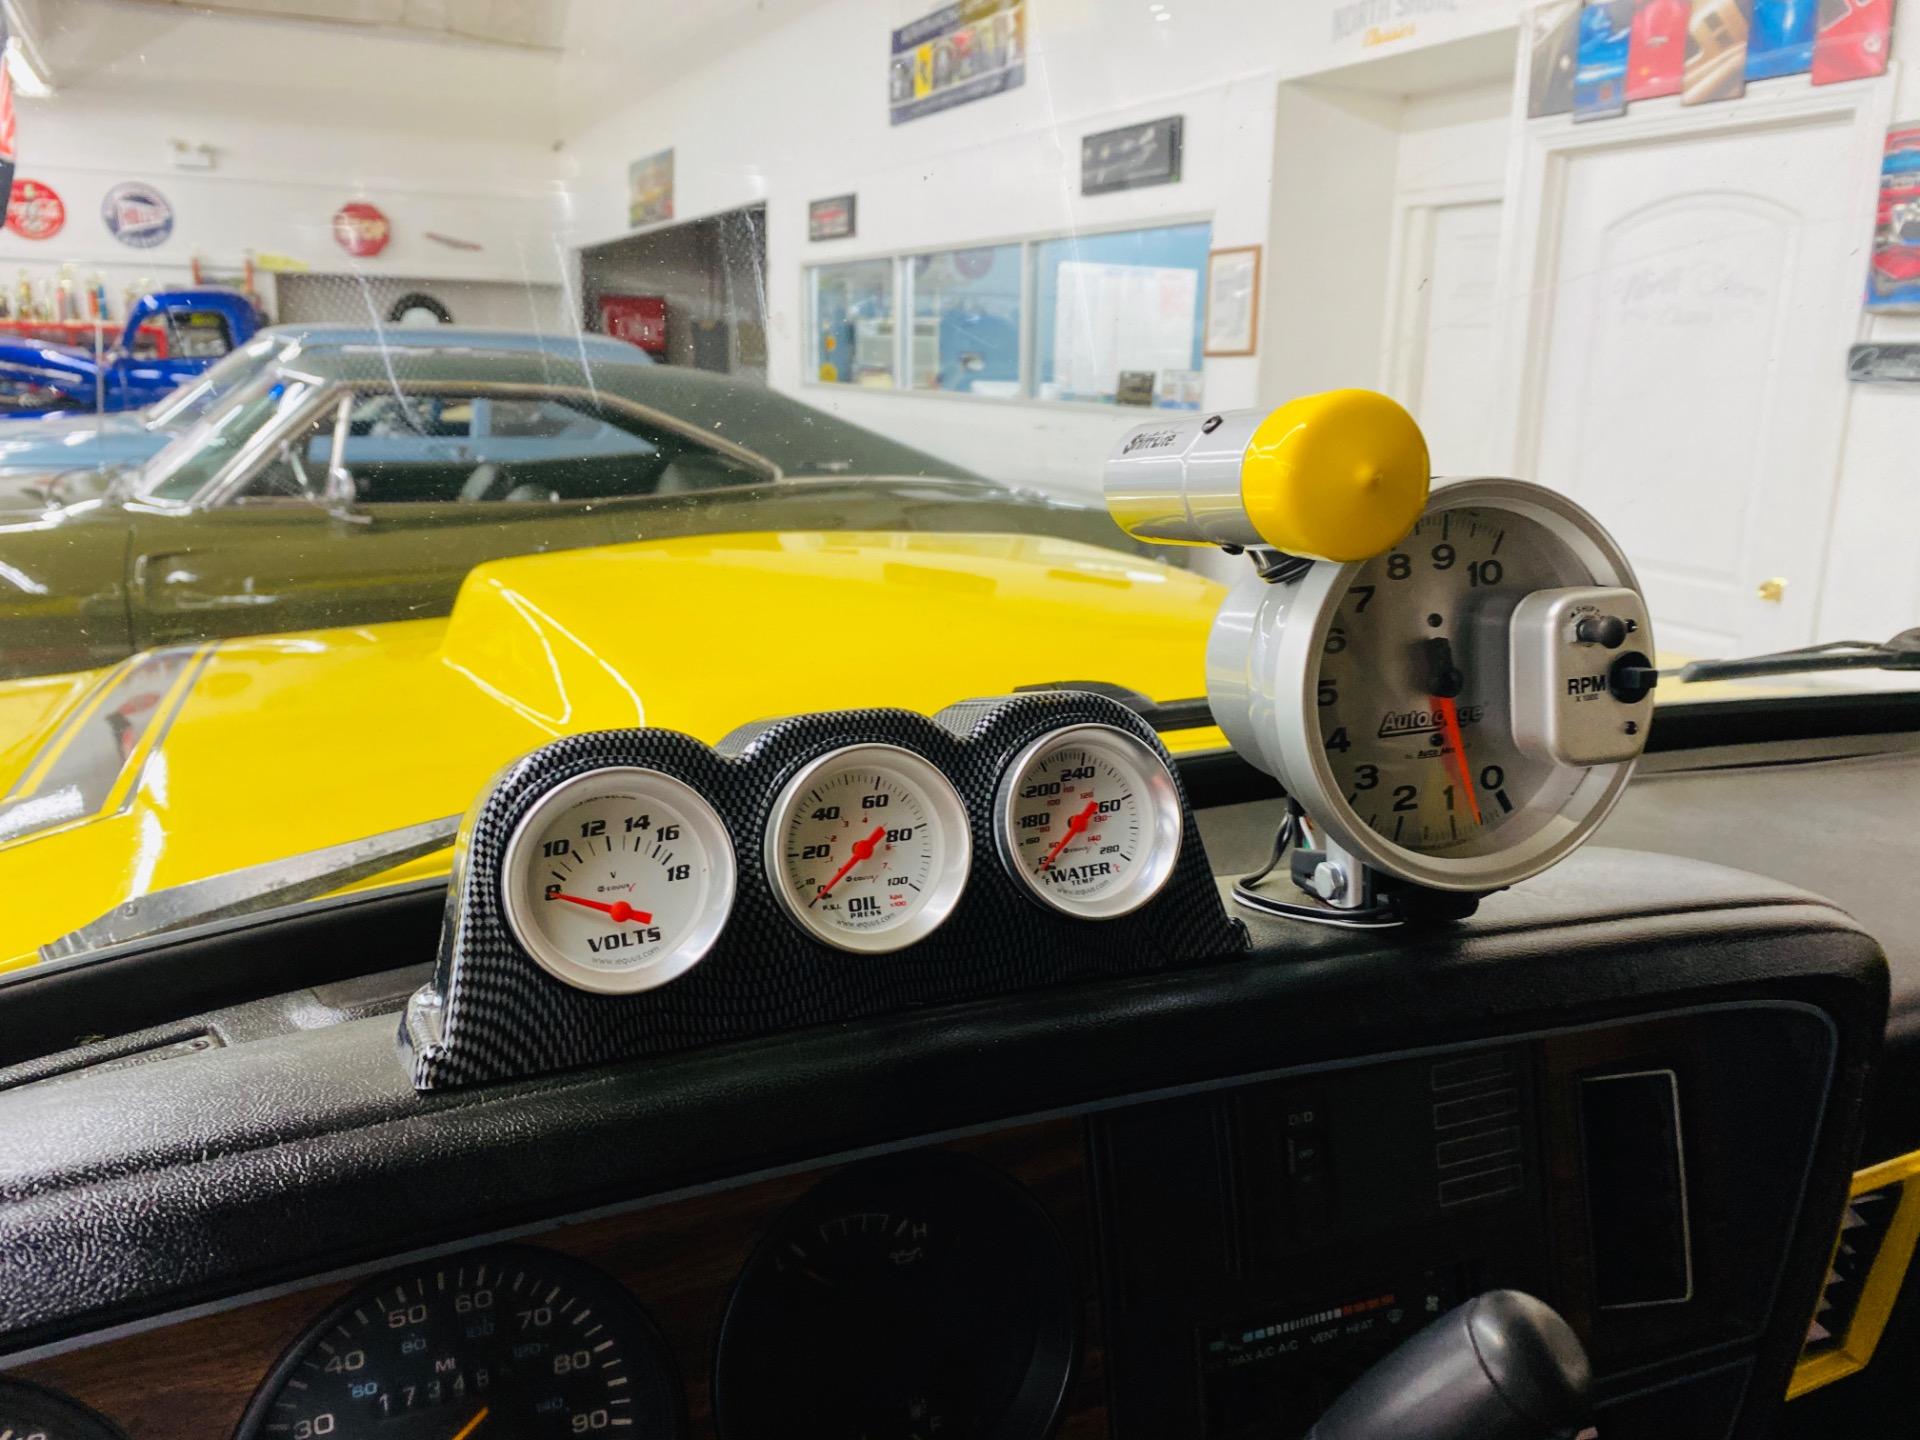 Used 1991 Dodge Ramcharger - 390 STROKER ENGINE - 500 LBFT TORQUE - SEE VIDEO - | Mundelein, IL